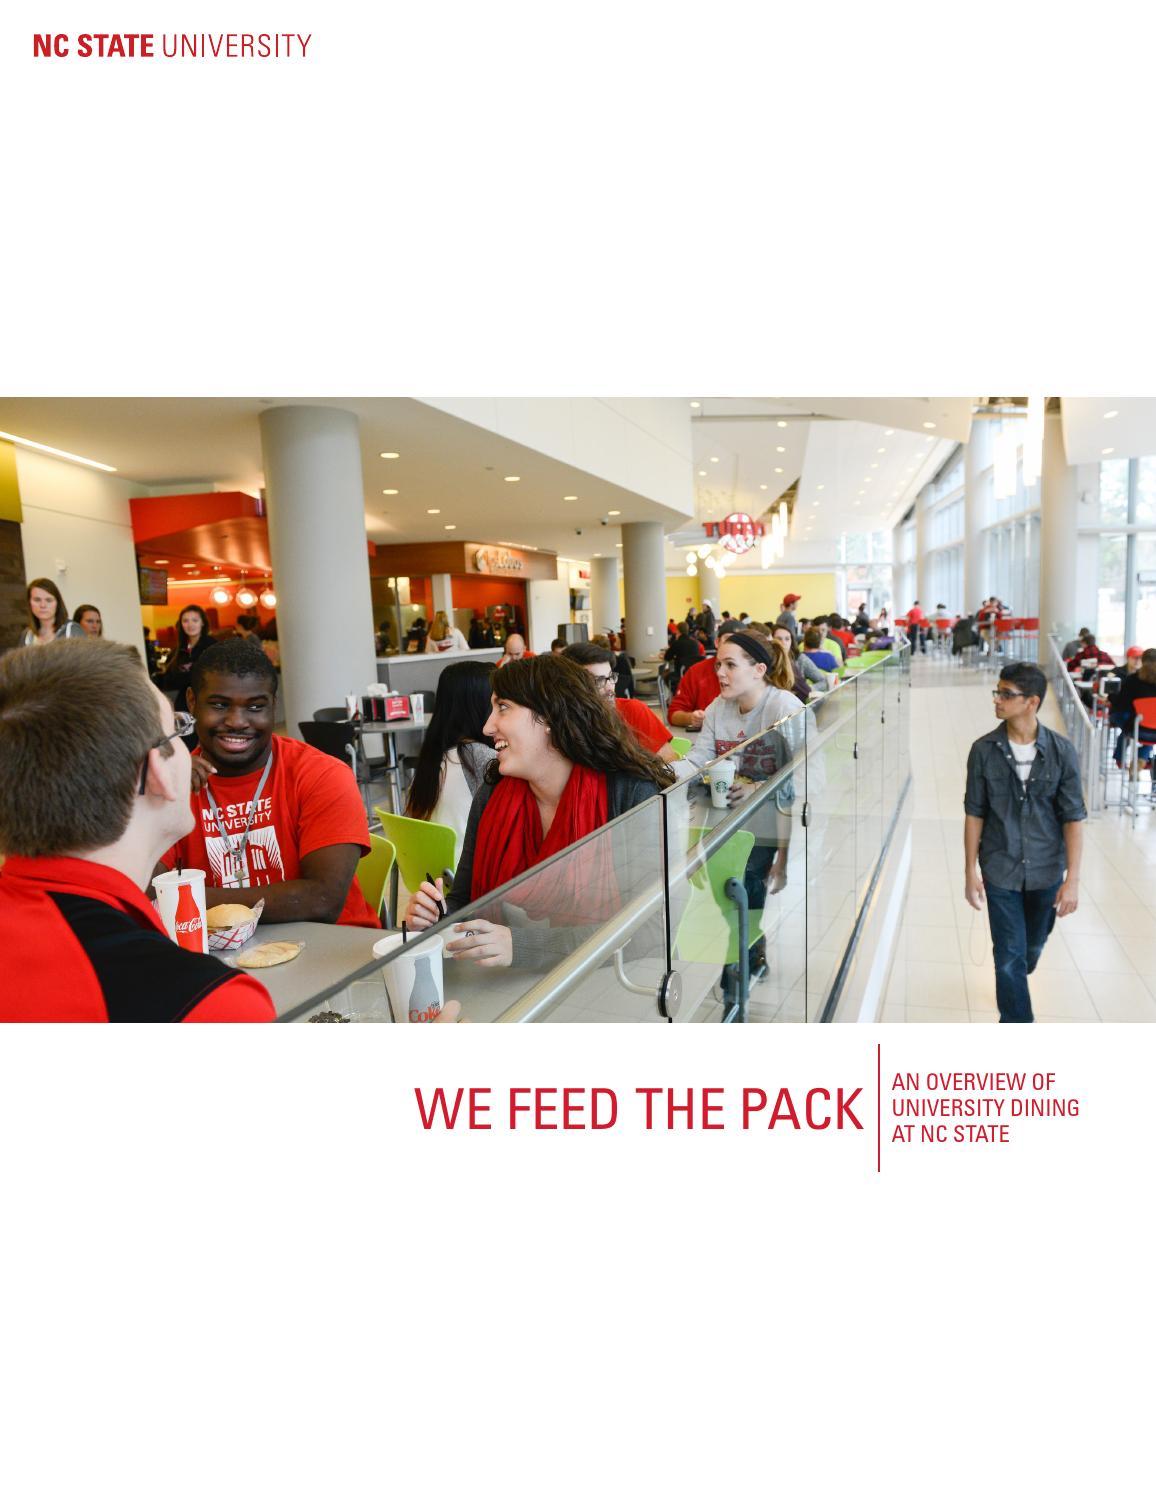 2015 NC State University Dining Overview by Jennifer Holland